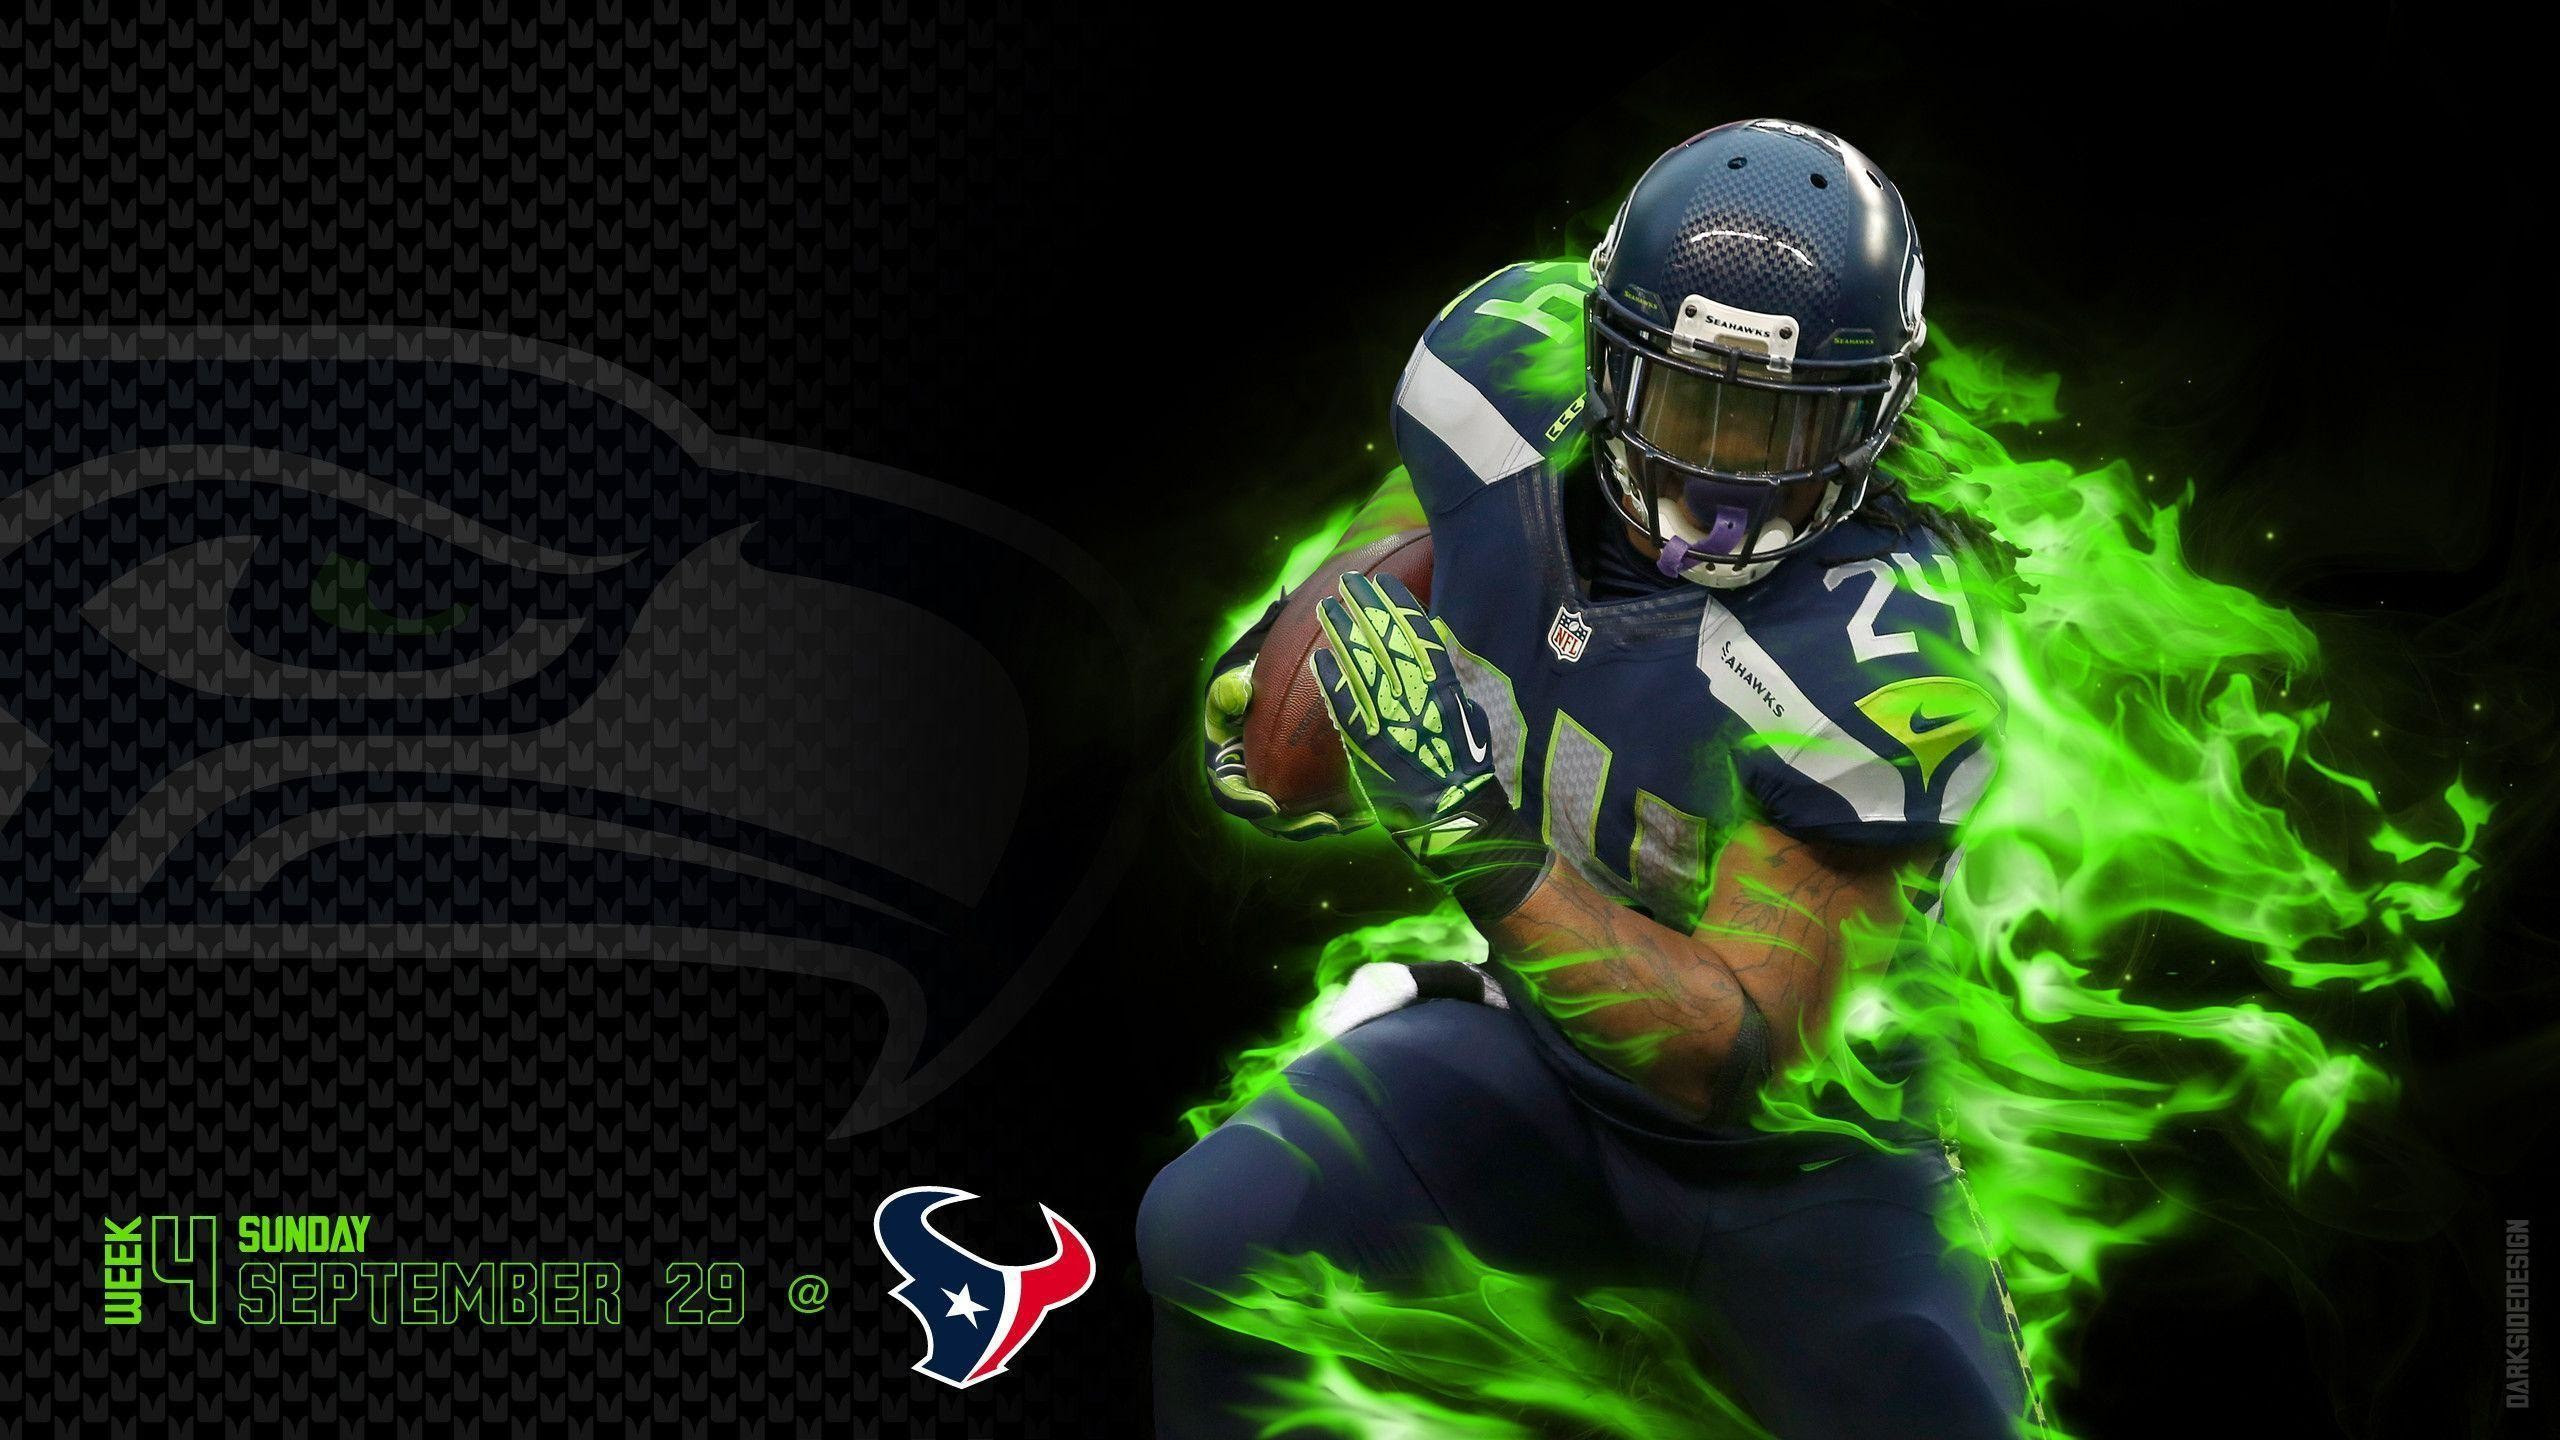 NFL Football Wallpaper 63  images